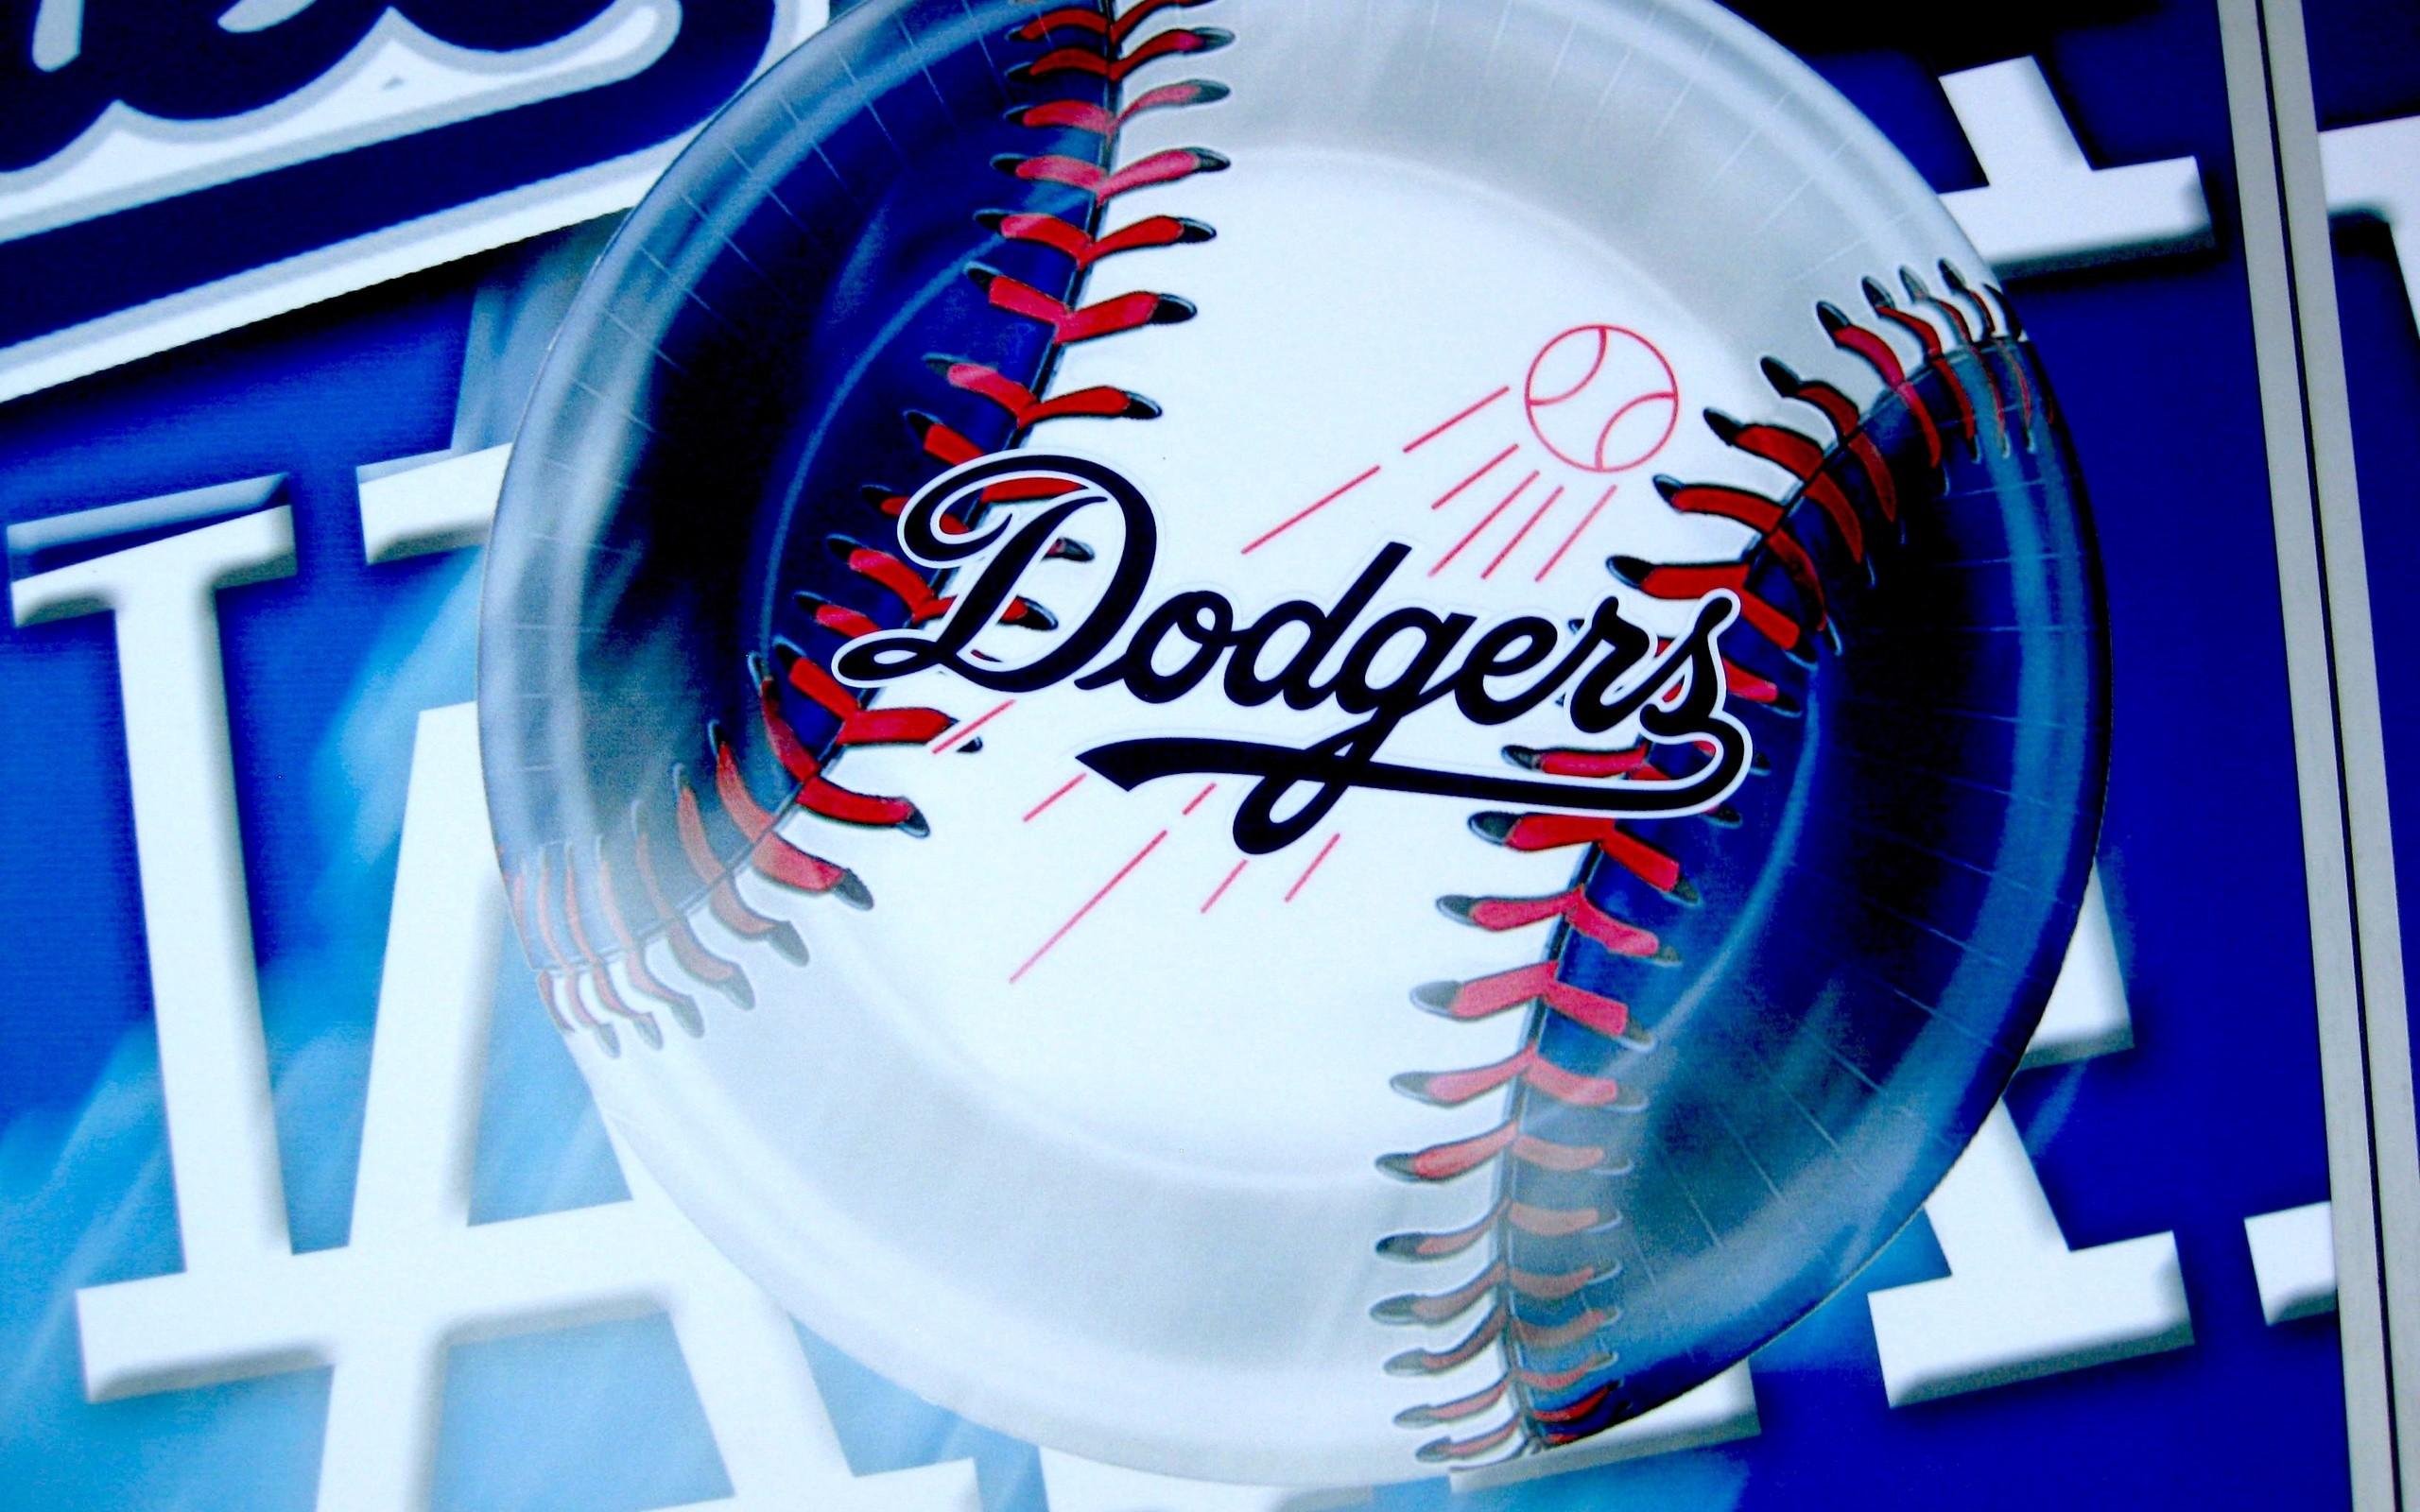 Los Angeles Dodgers Baseball Wallpapers ·① WallpaperTag  Dodgers Baseball